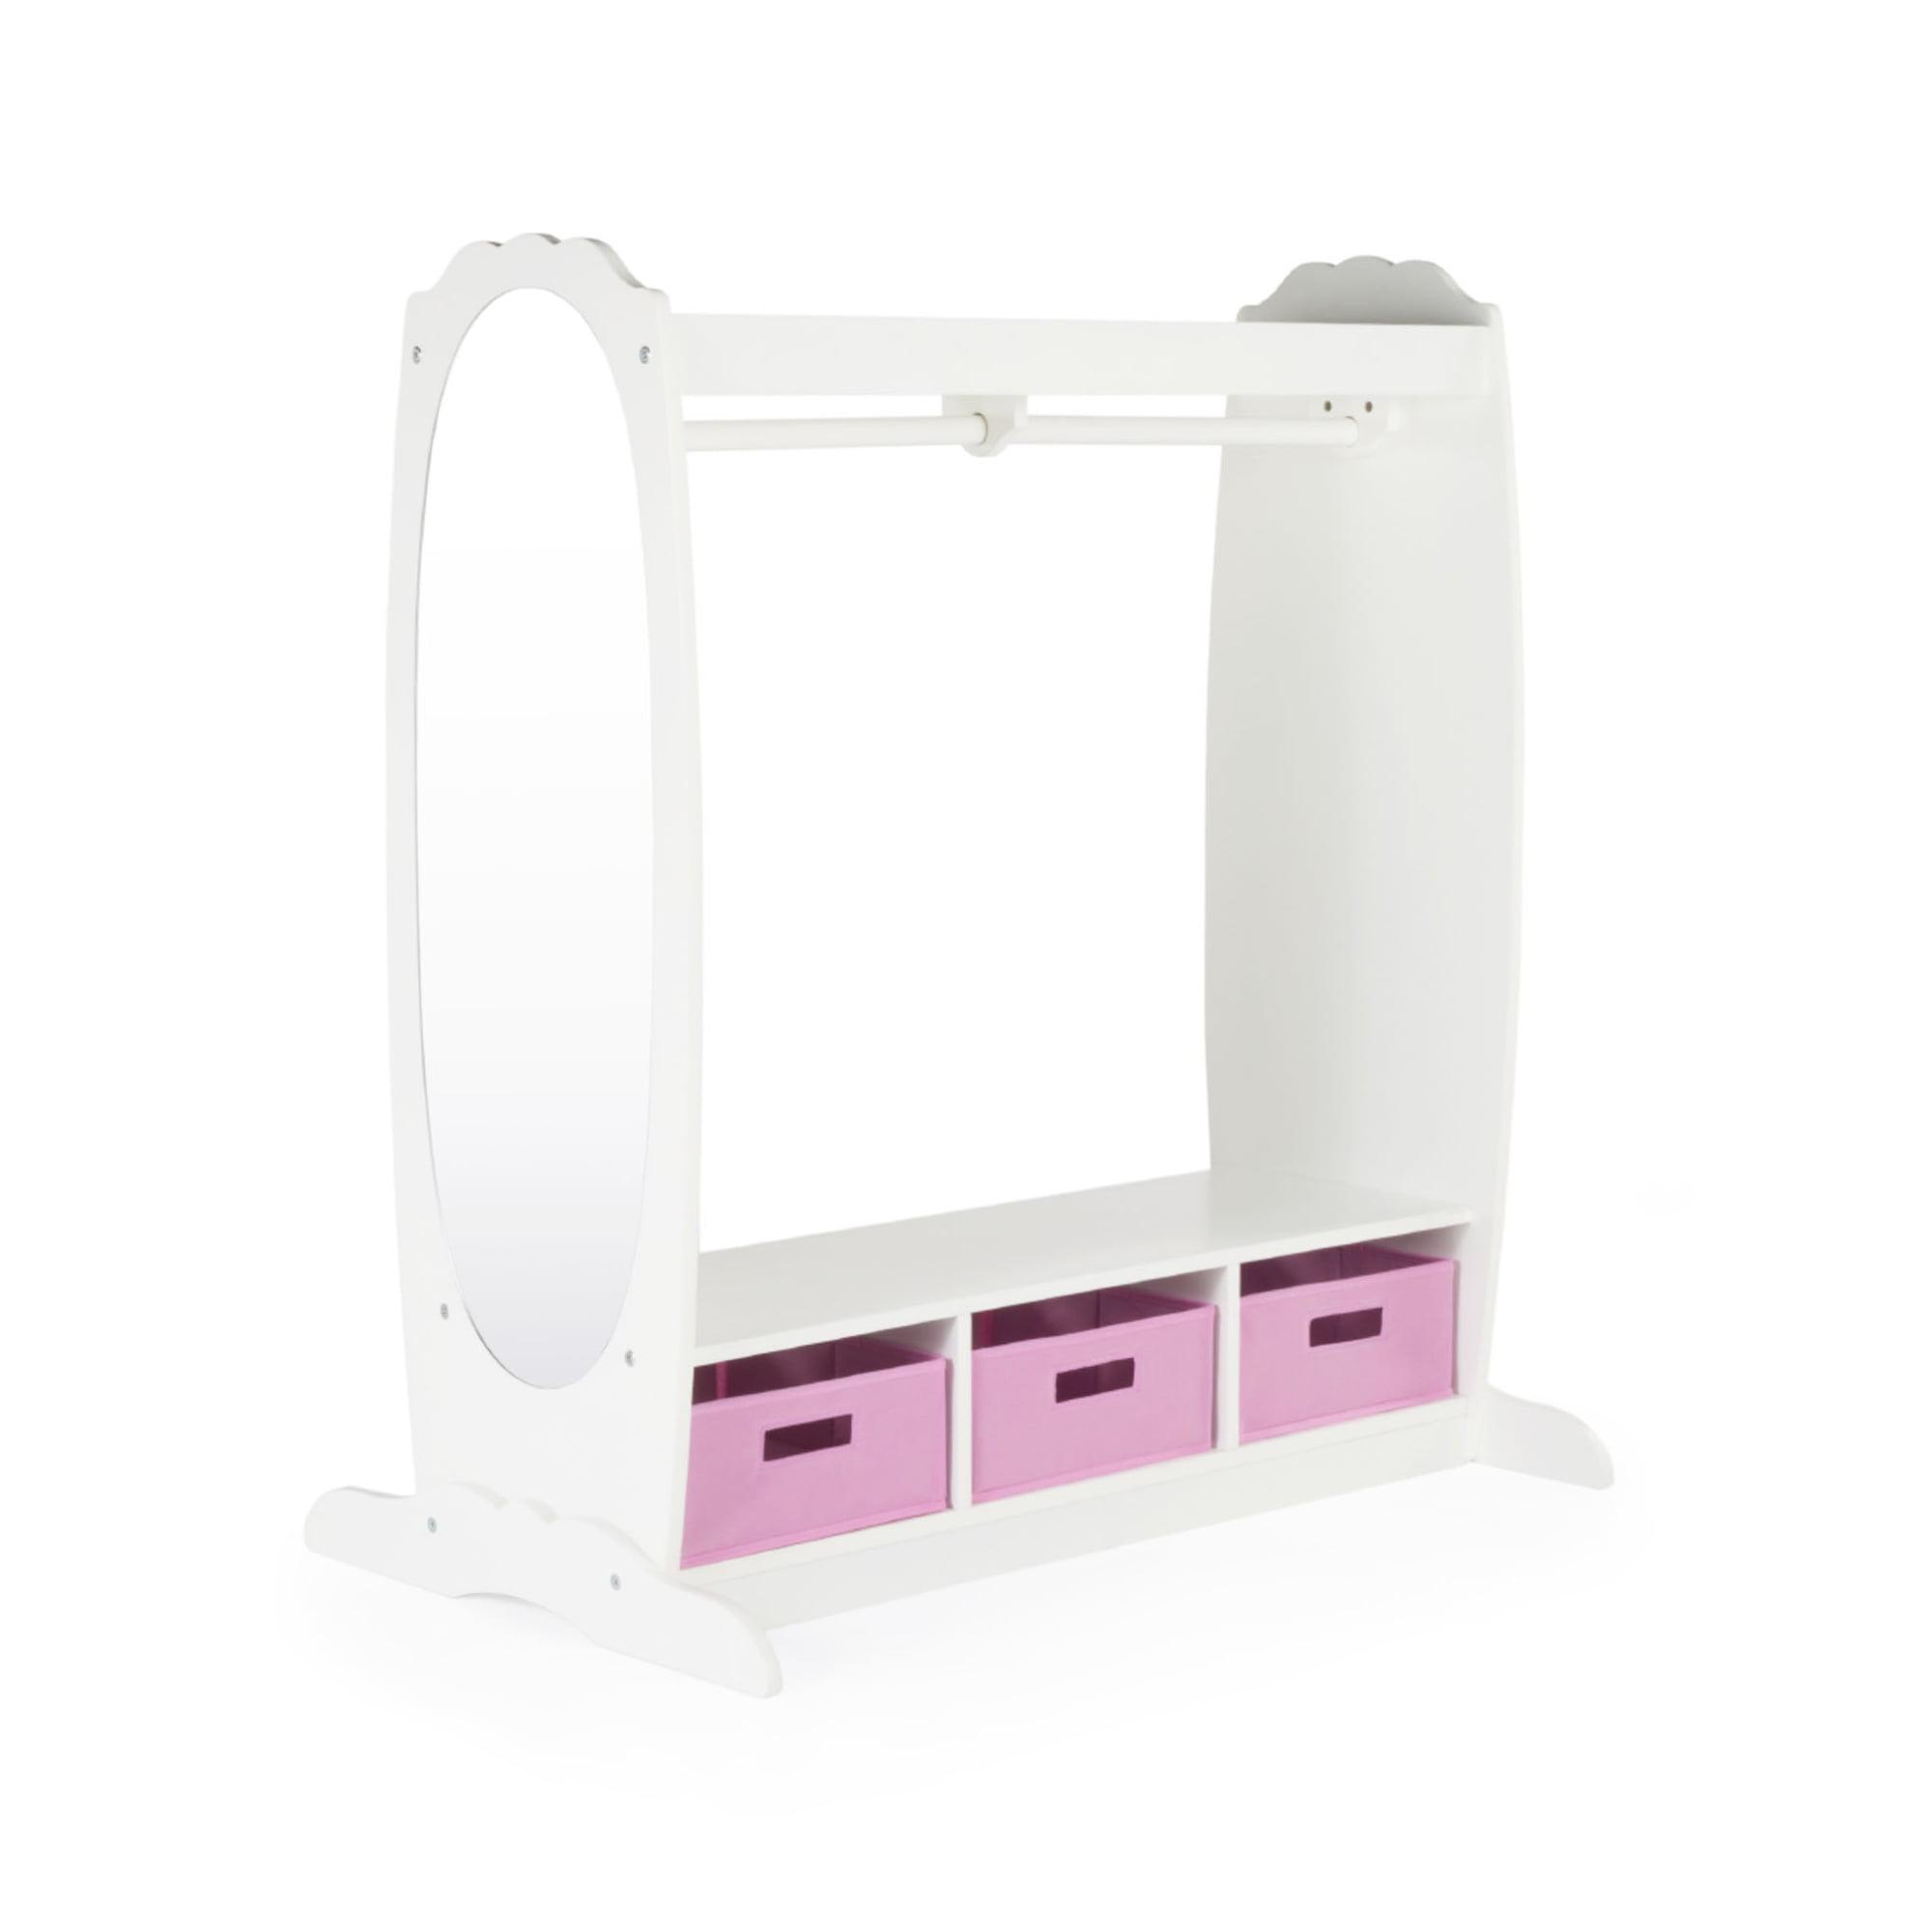 Dress-Up Storage Center White by Guidecraft